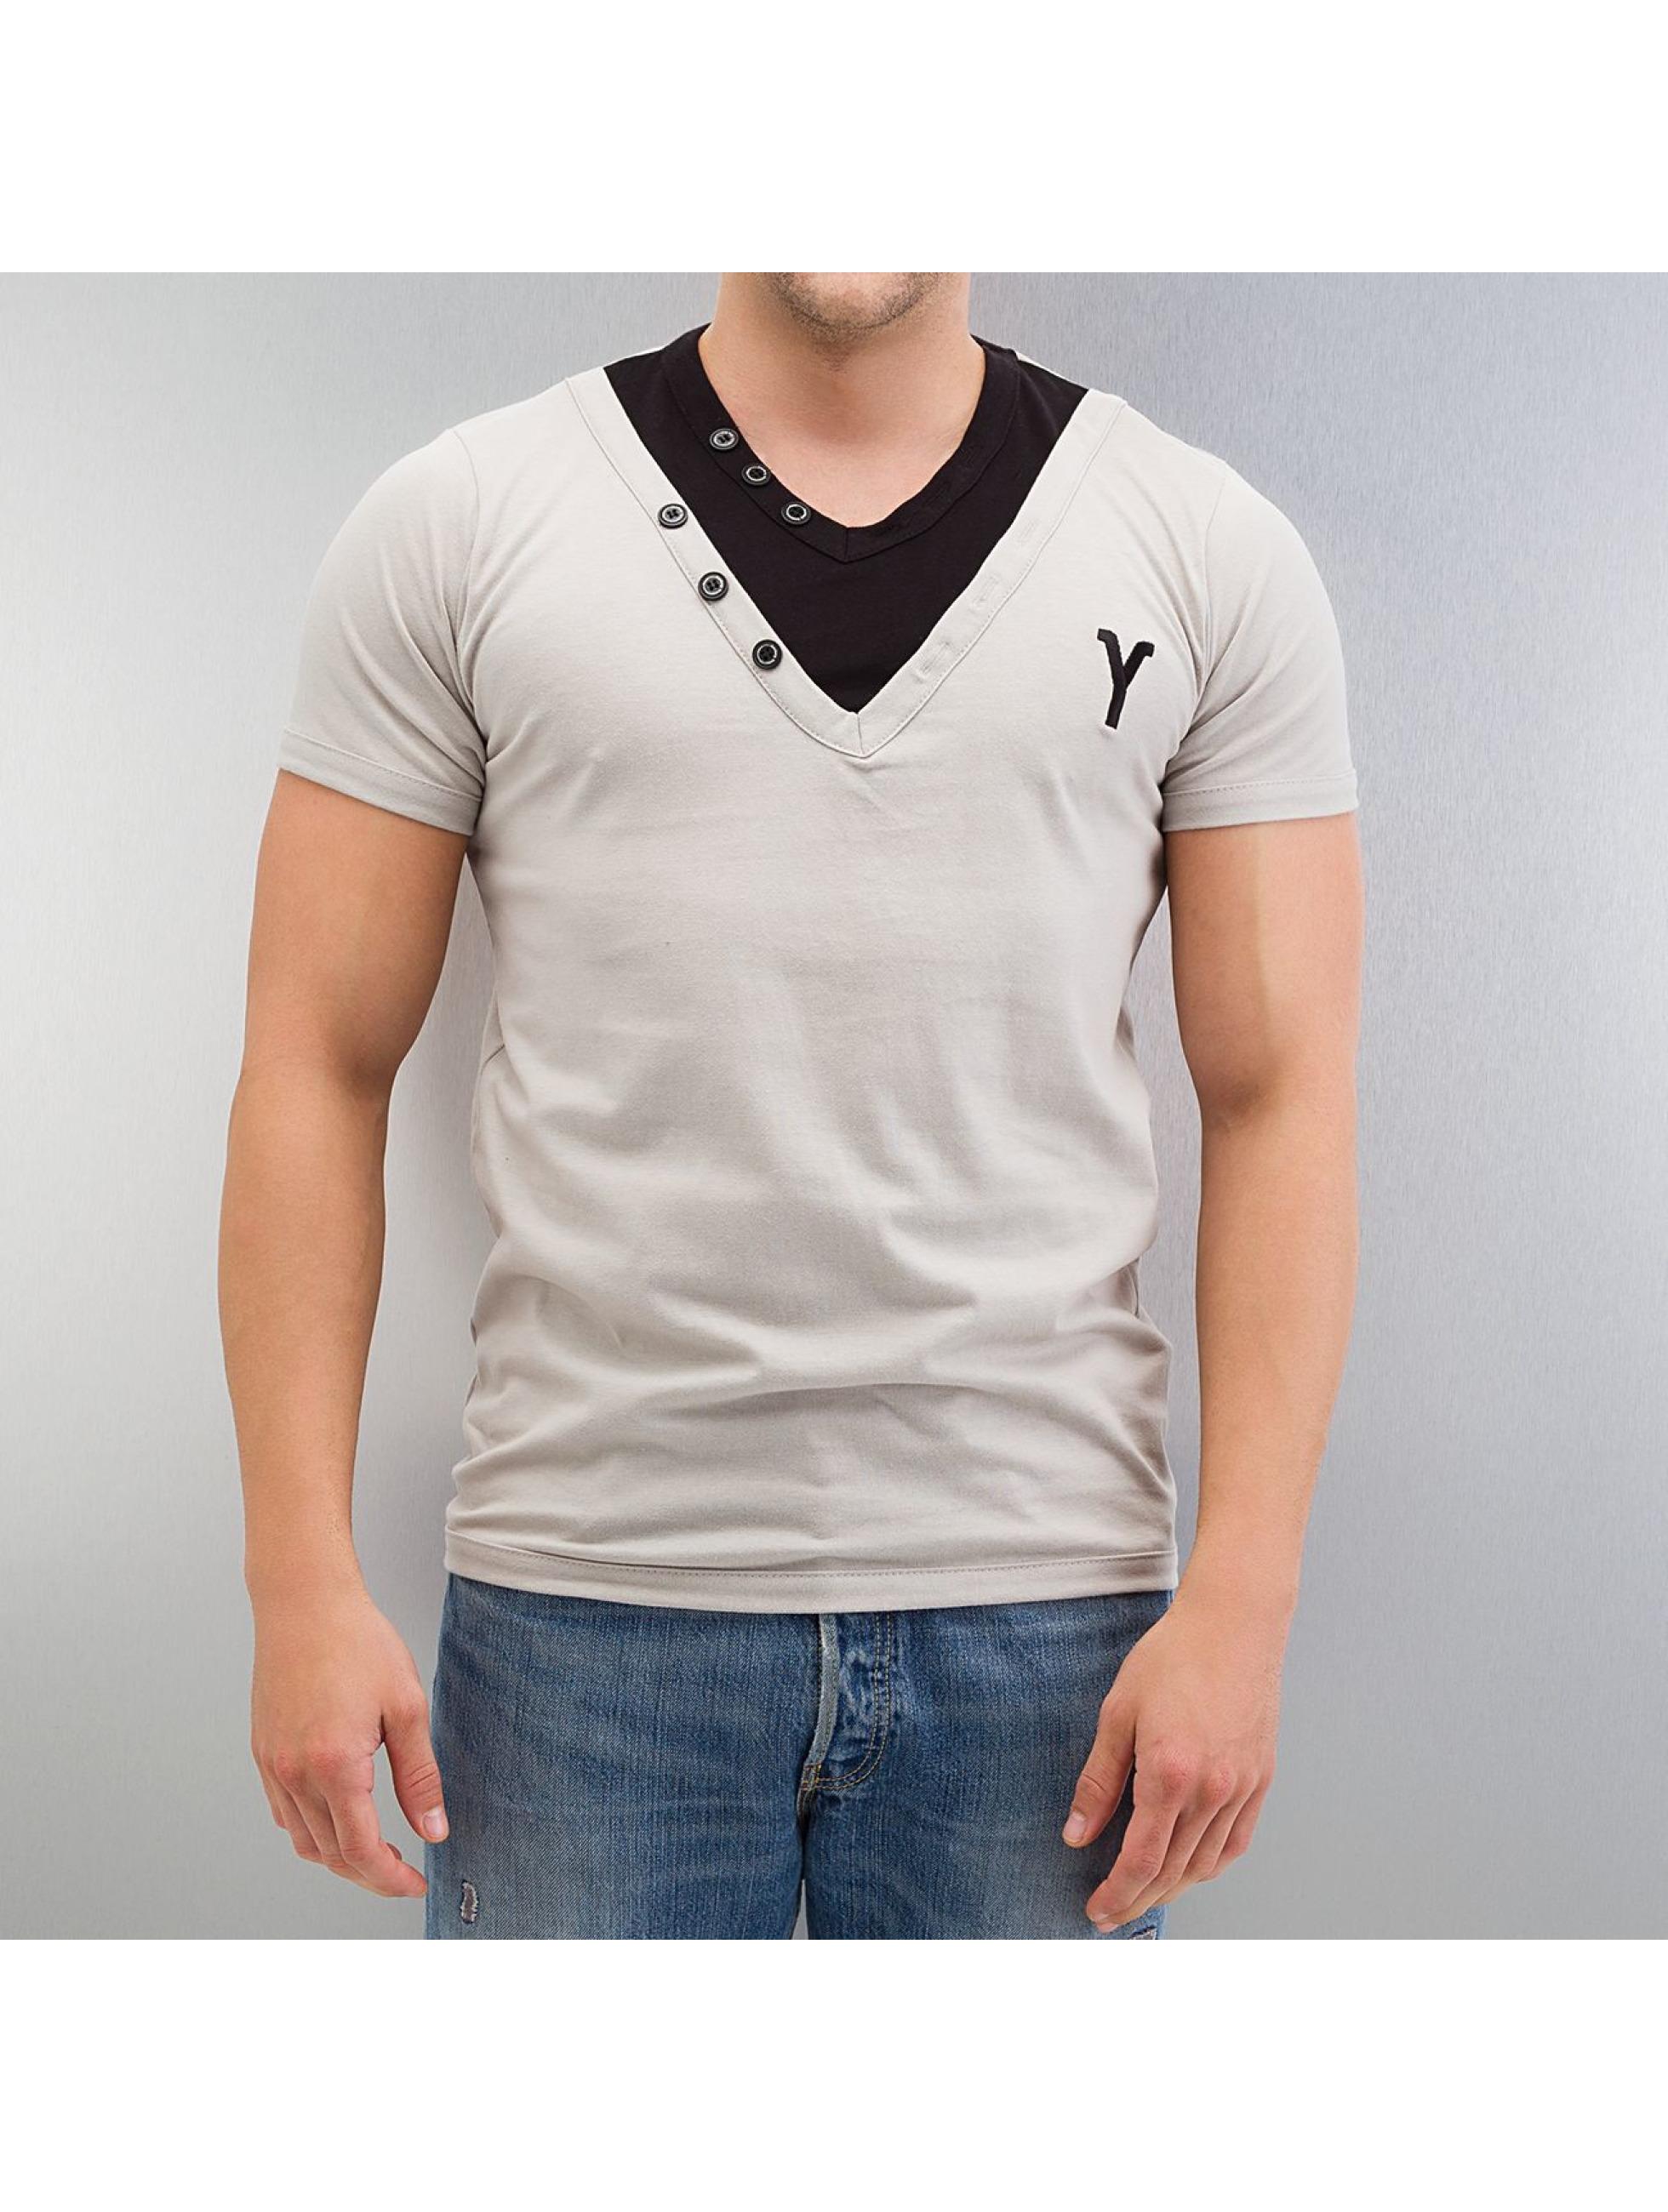 Yezz Candor Slim Fit T Shirt Grey Black